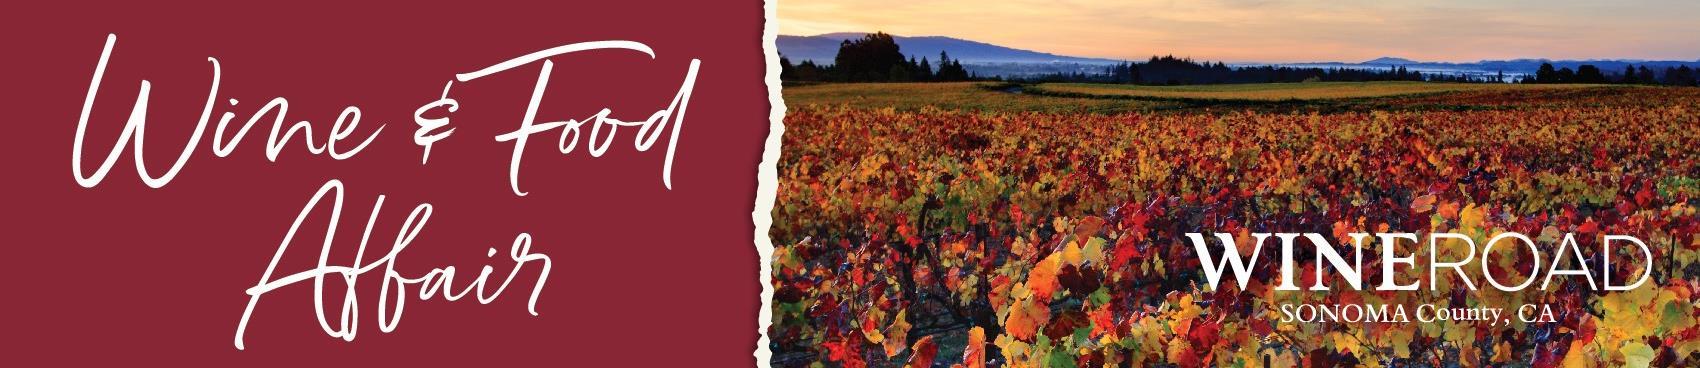 23rd Annual Wine & Food Affair